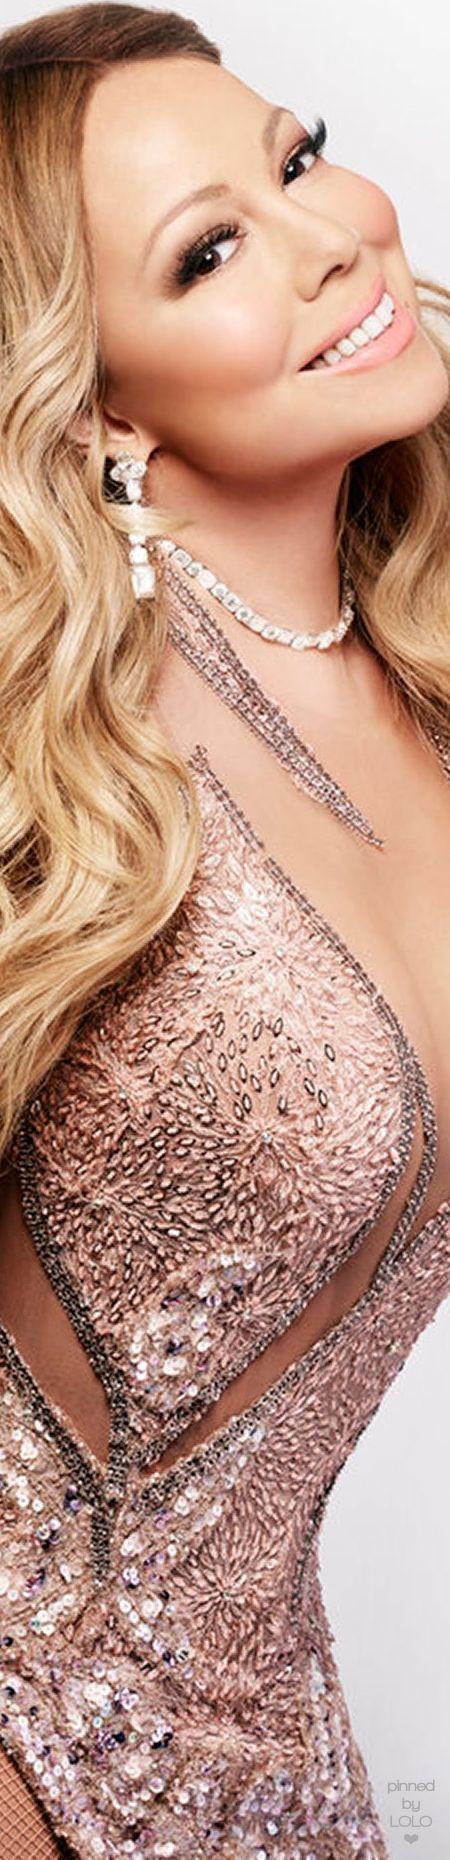 Mariah Carey | LOLO❤︎